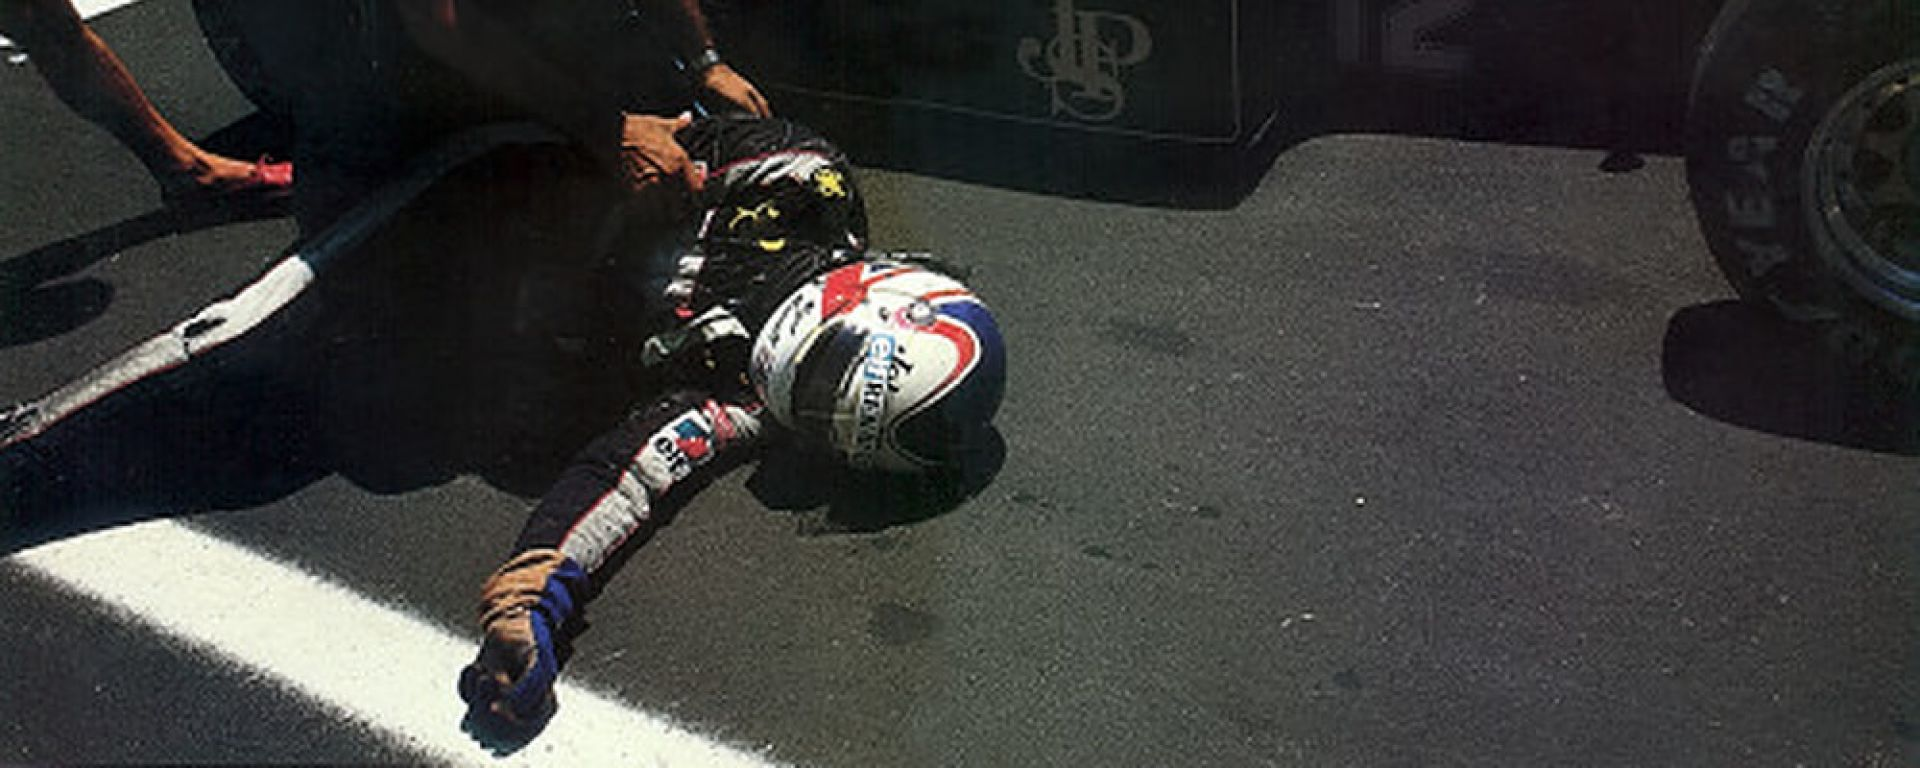 F1, GP Usa 1984: Nigel Mansell a terra dopo aver spinto la sua monoposto